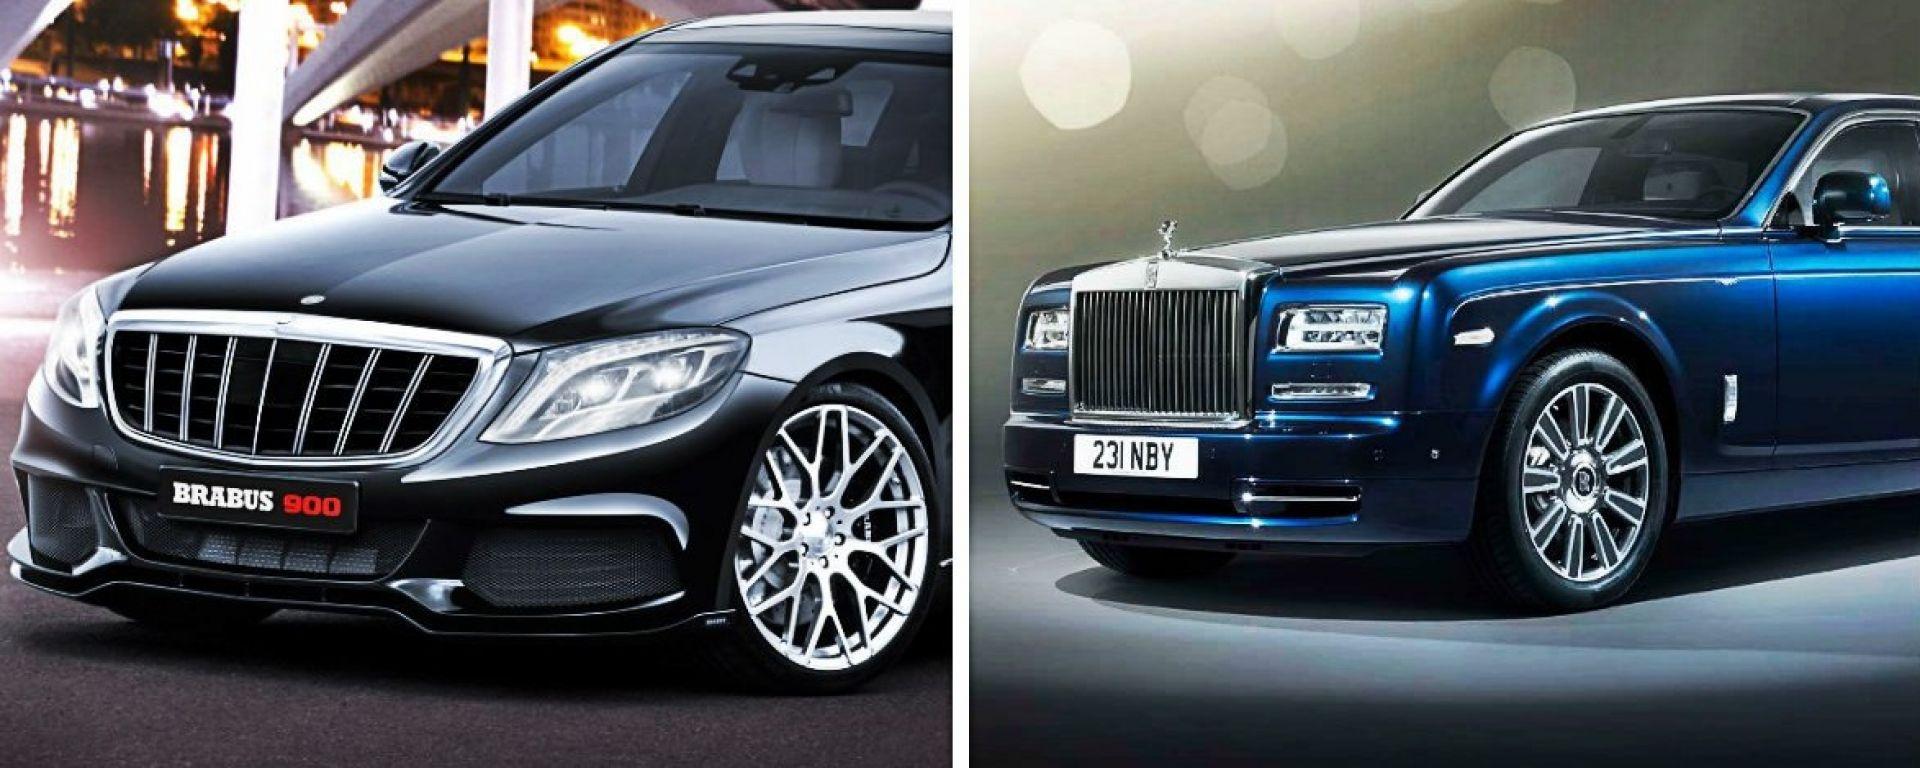 Brabus S900 vs Rolls Royce Phantom